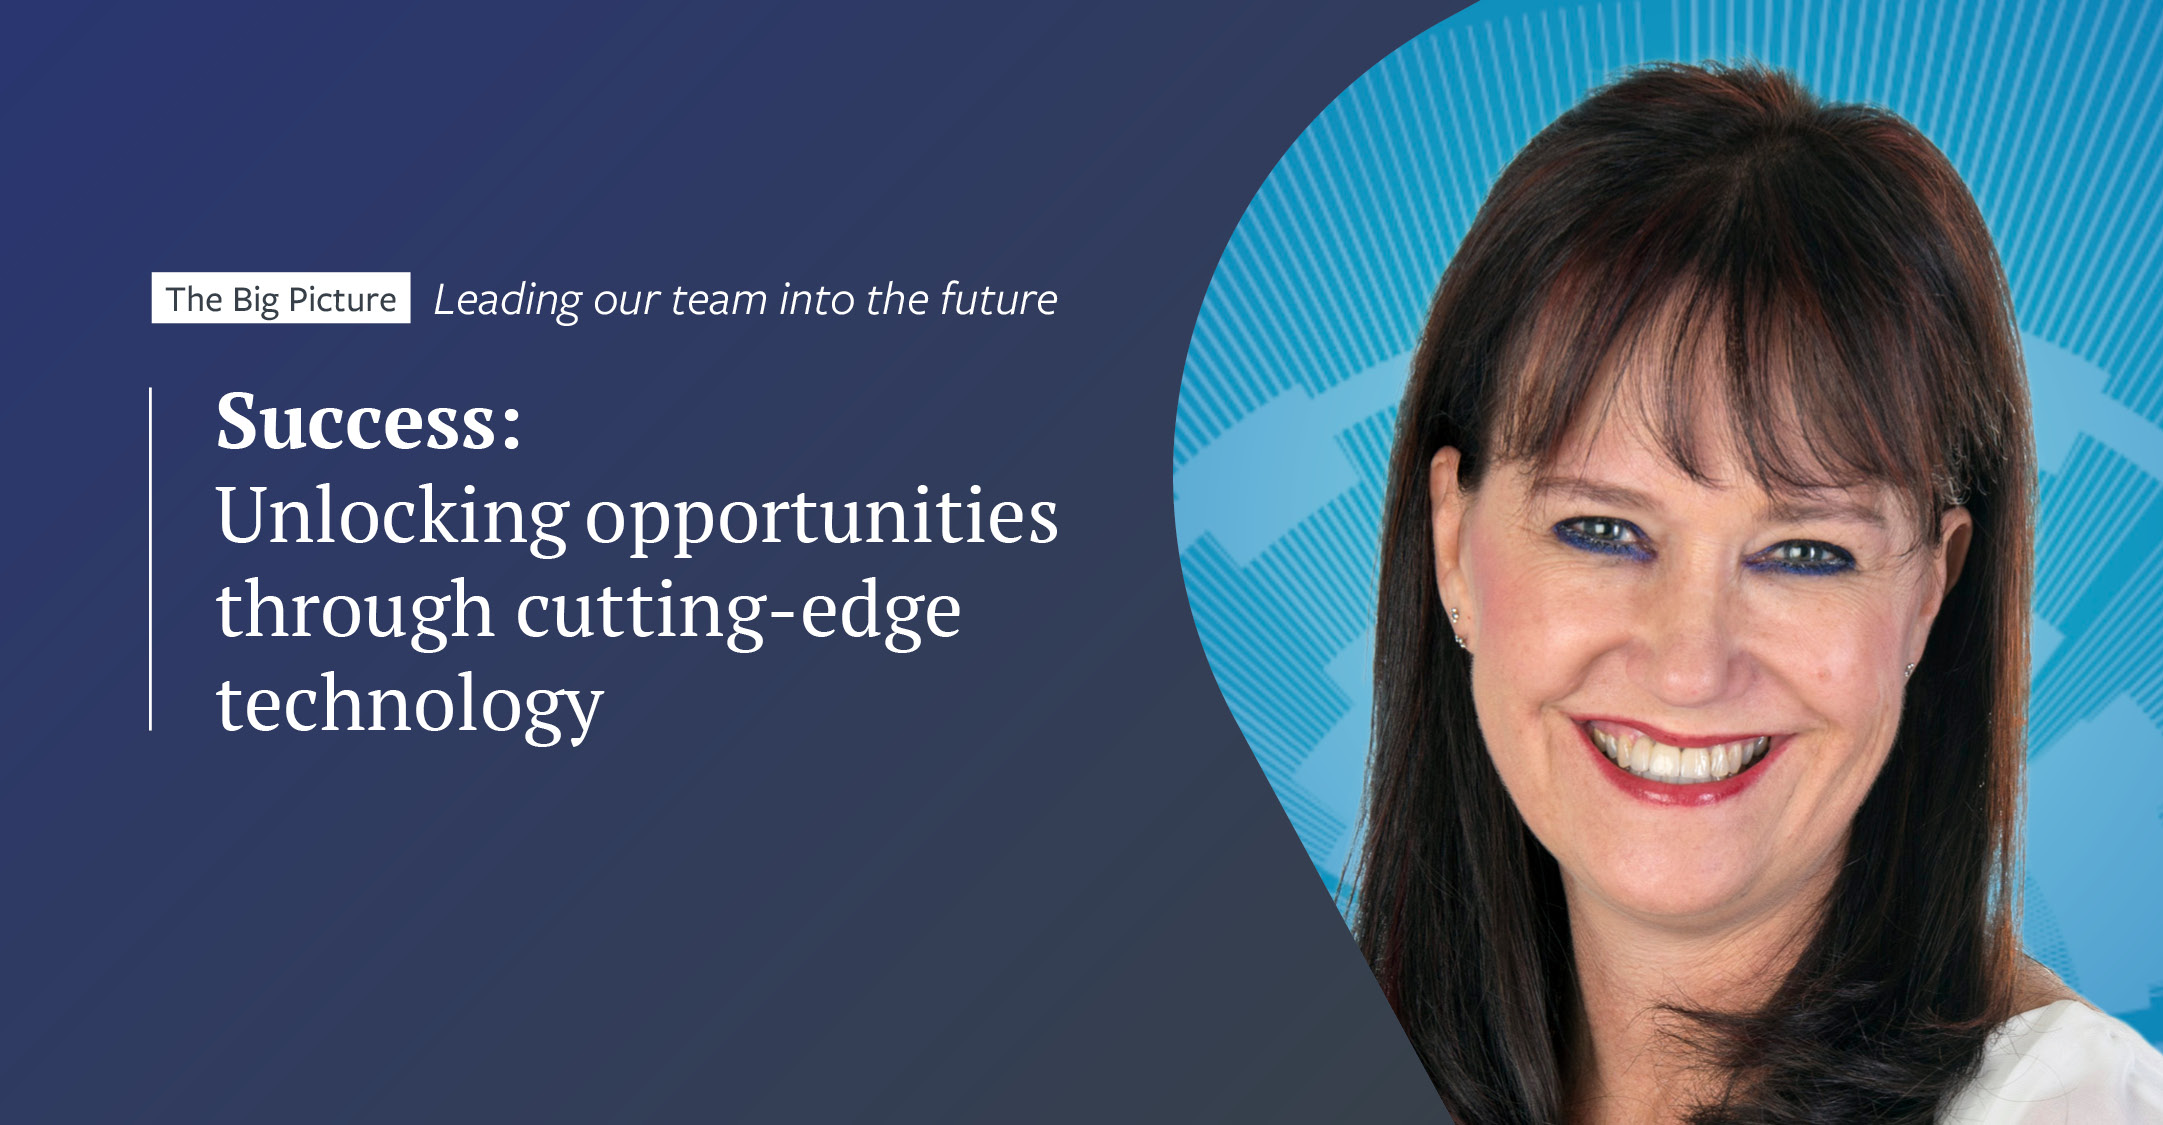 Success: Unlocking opportunities through cutting-edge technology